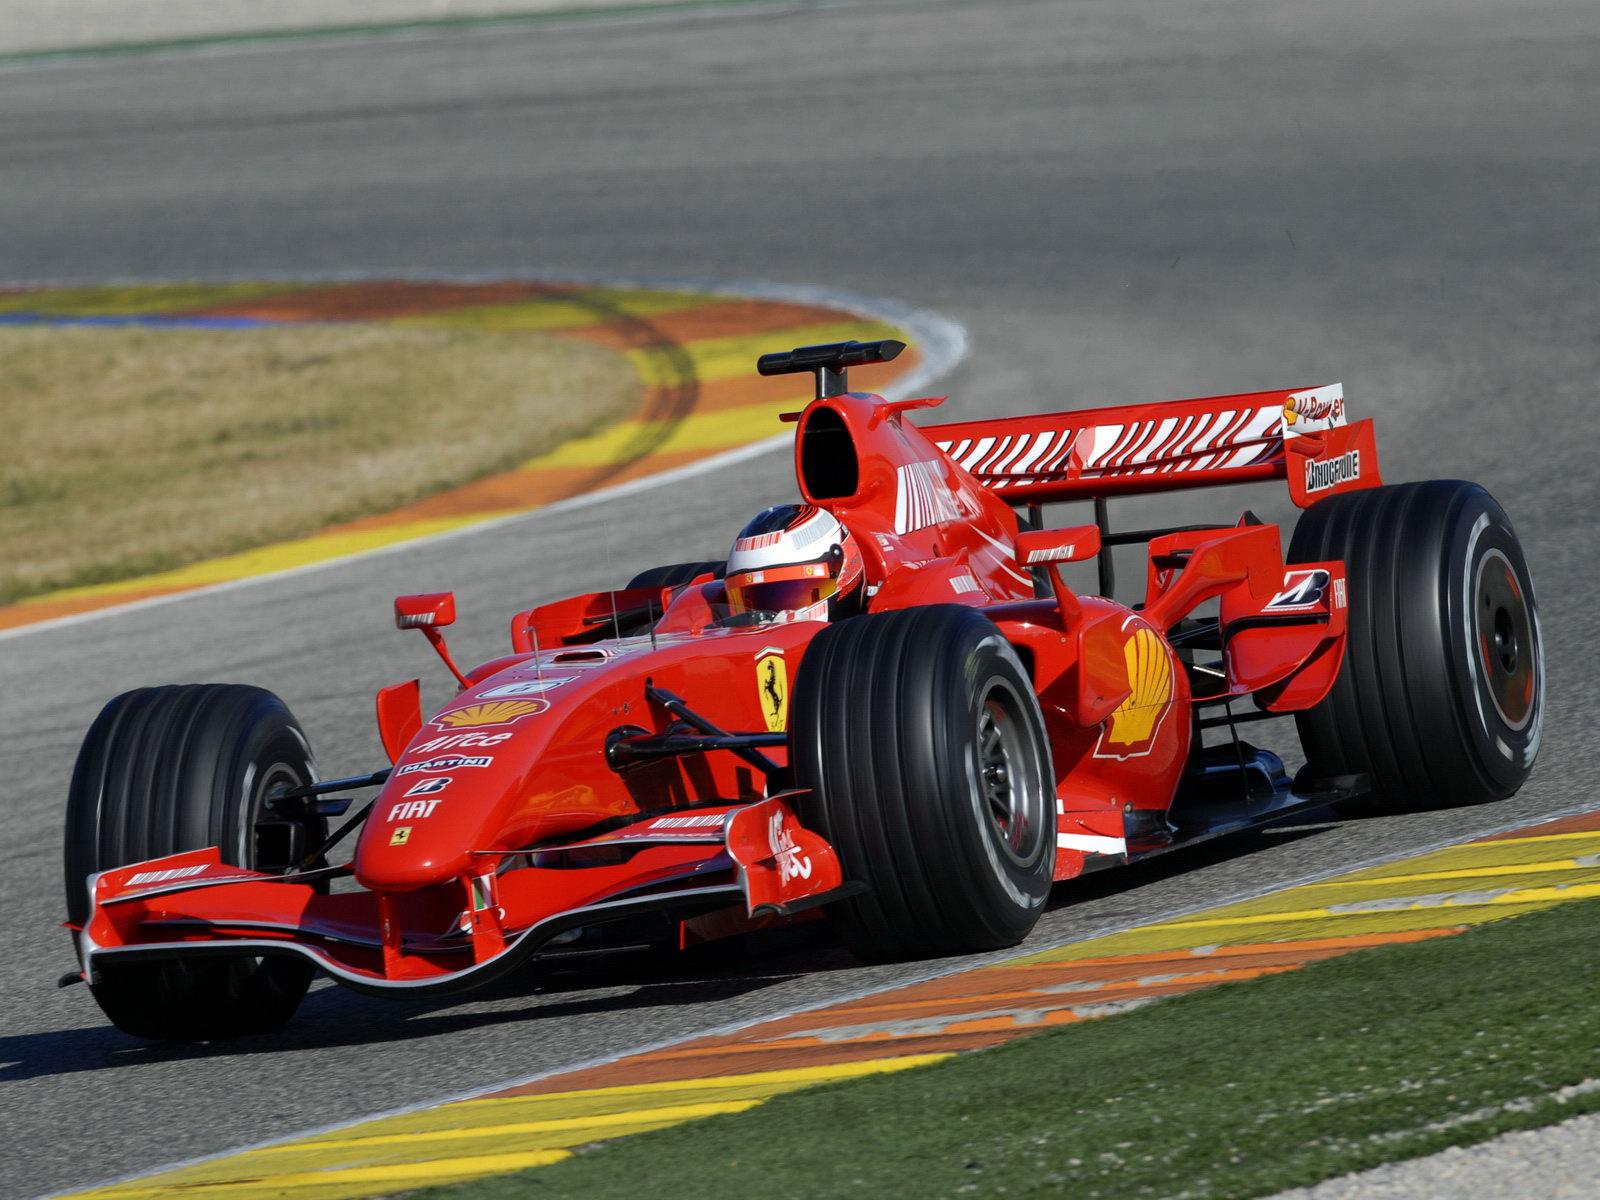 ferrari-f2007-hitech-sport